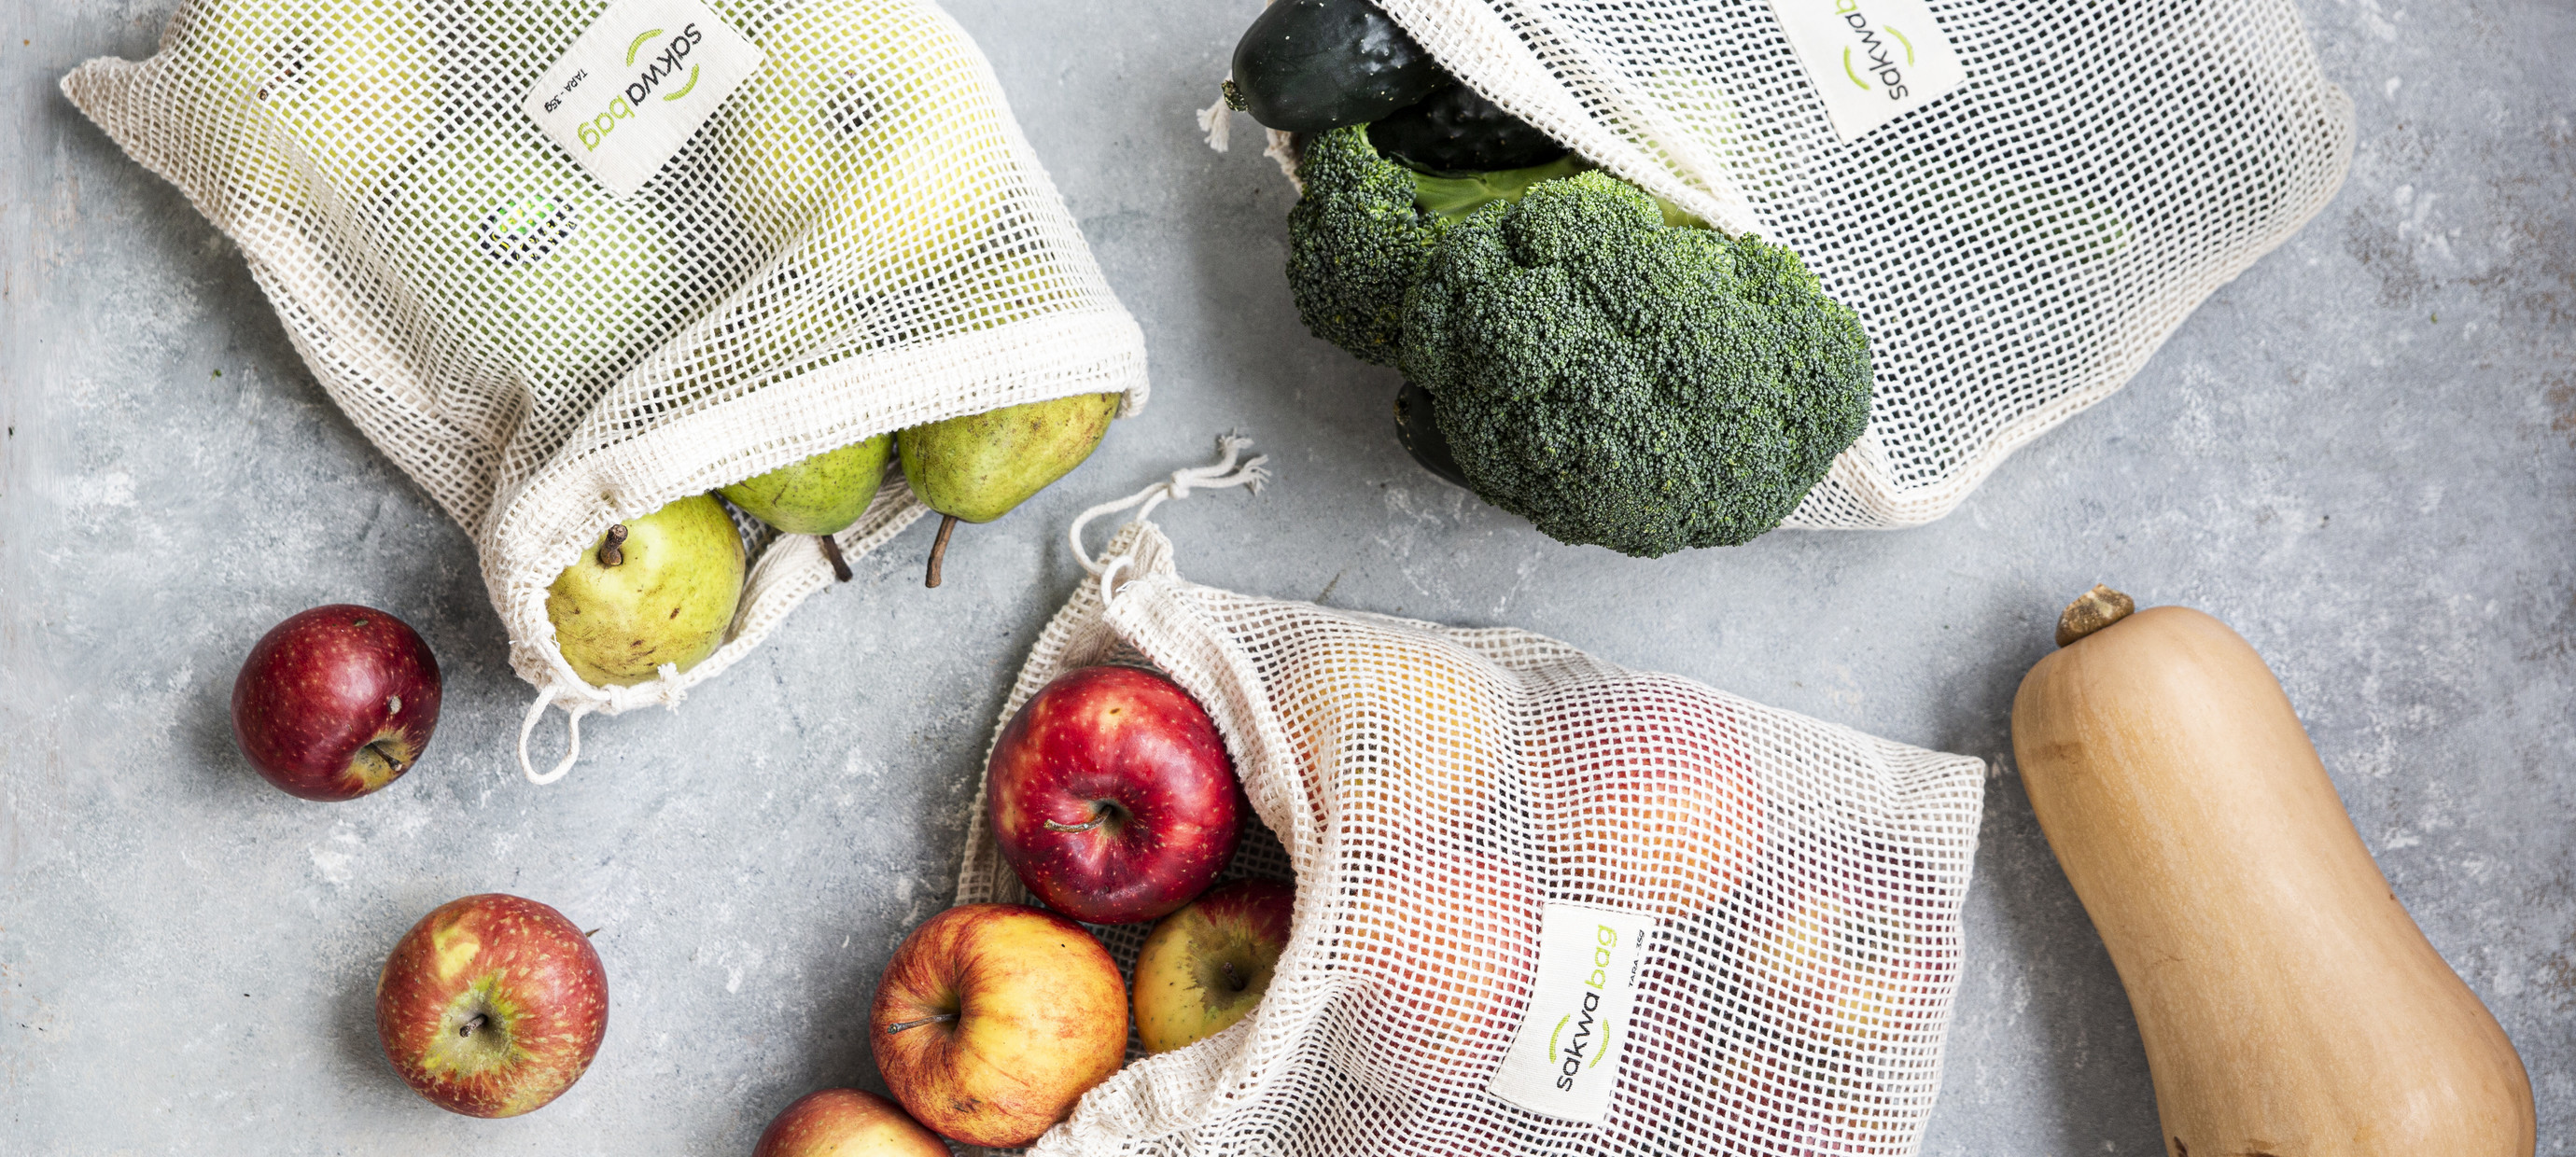 Getest: De Sakwabag groente en fruitzakjes